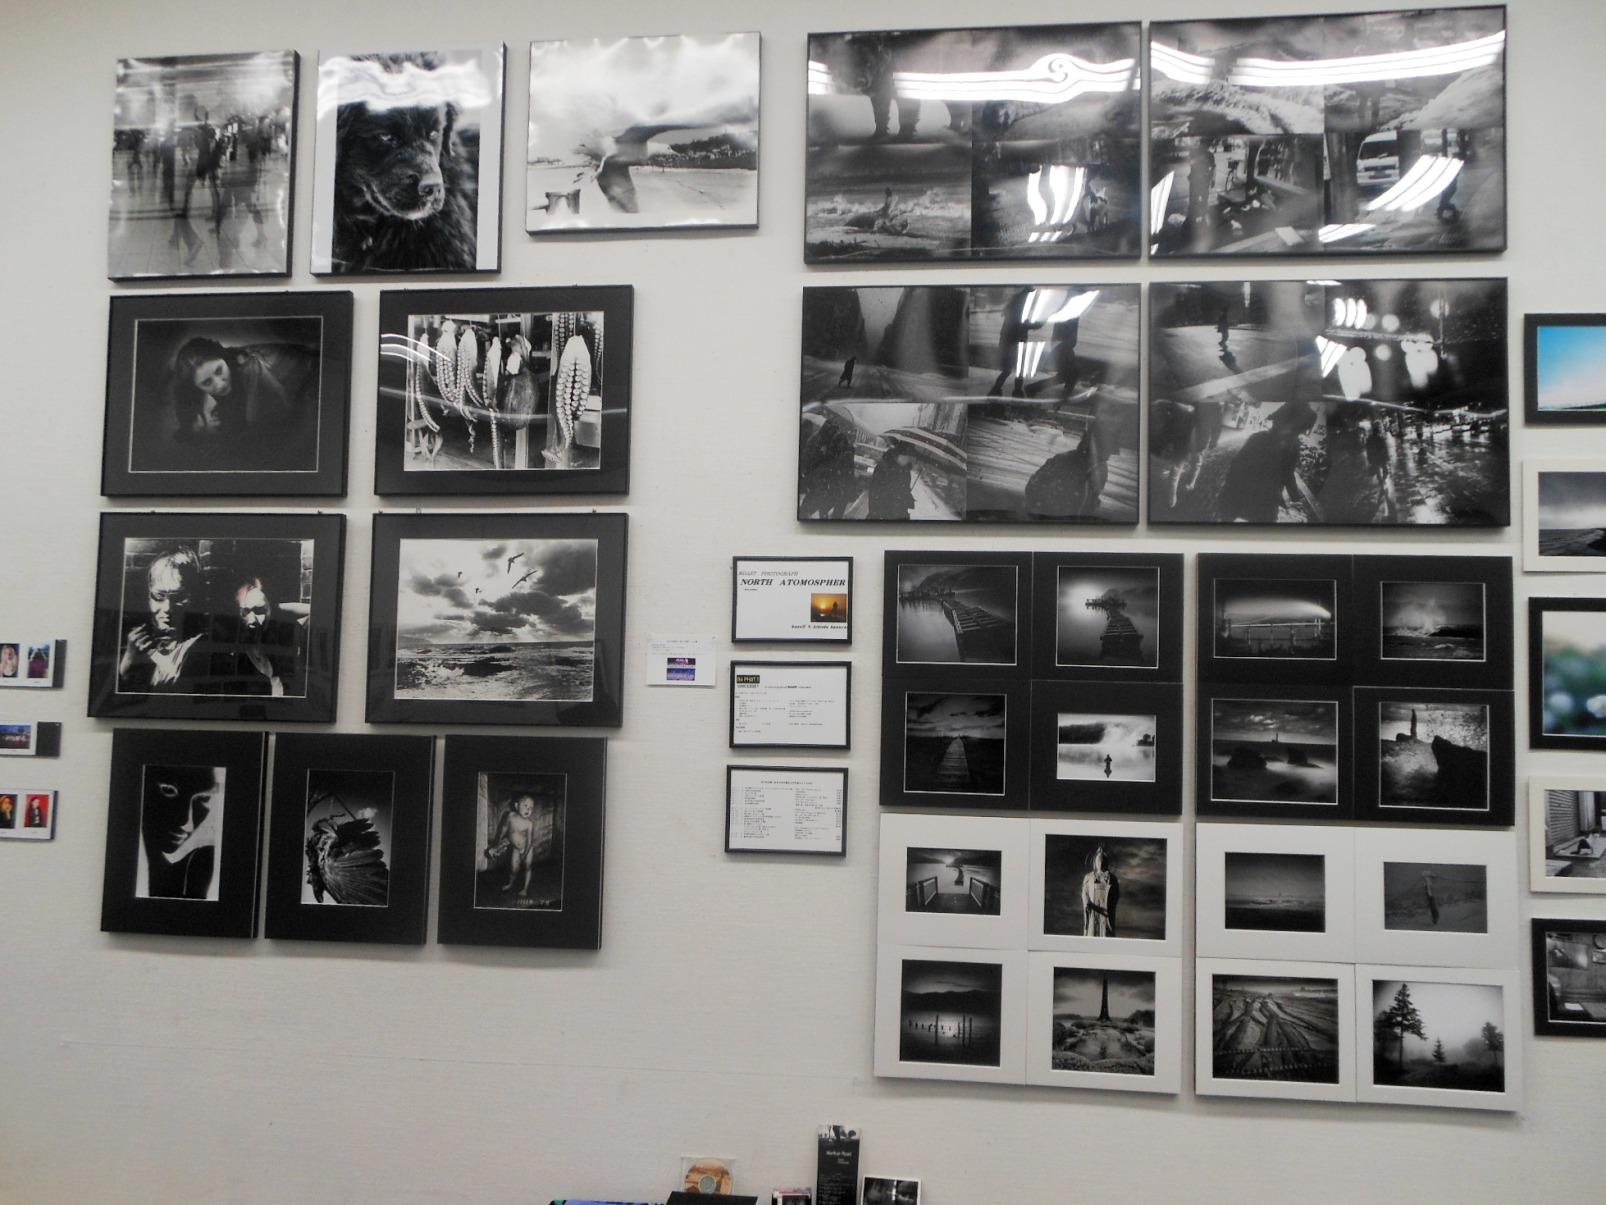 1885)②「写真クラブ「BePHaT!!」 第9回作品展 『夢 Photo 2012』」市民g. 終了11月21日(水)~11月25日(日)_f0126829_21454593.jpg